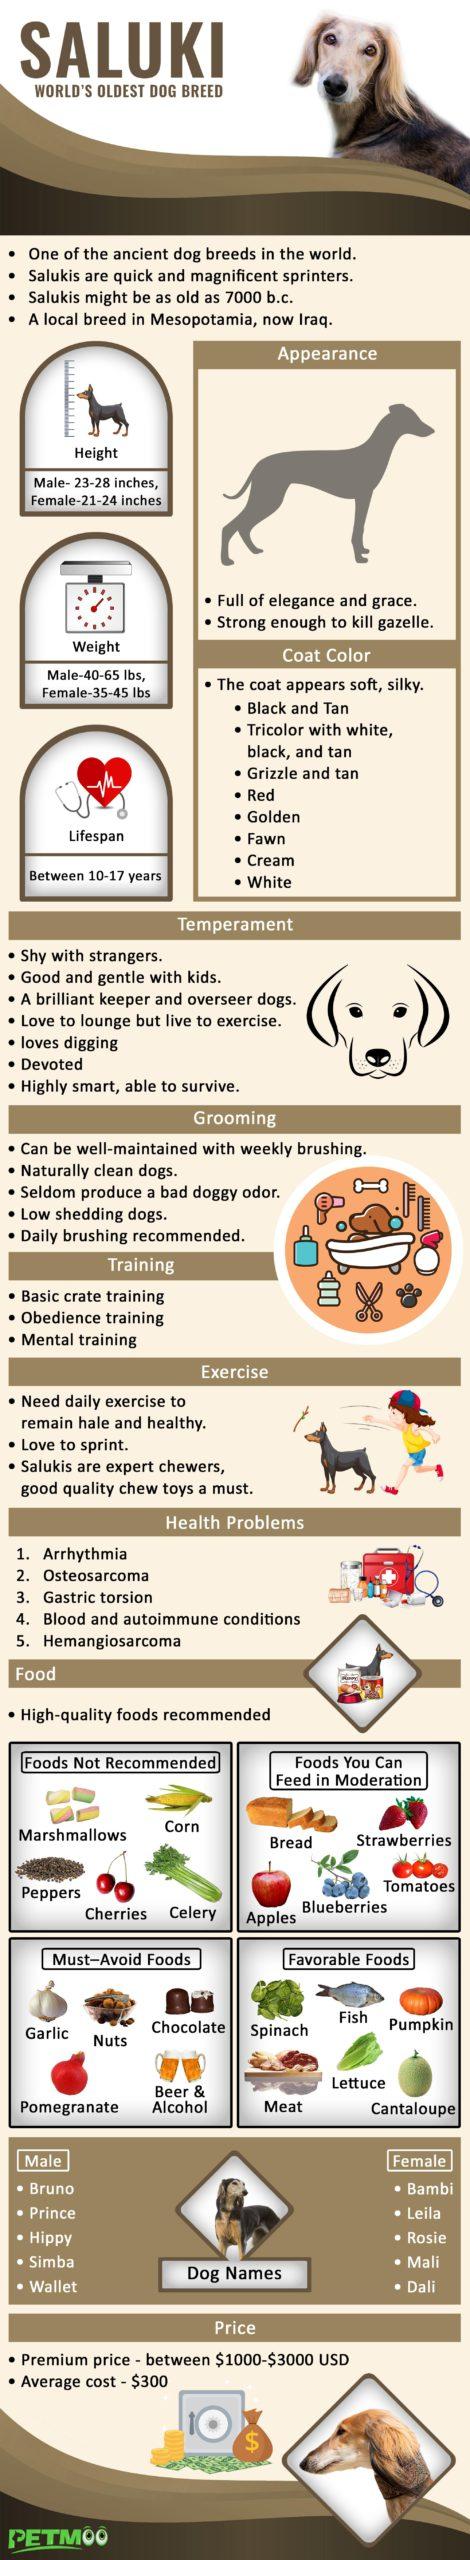 Saluki Infographic